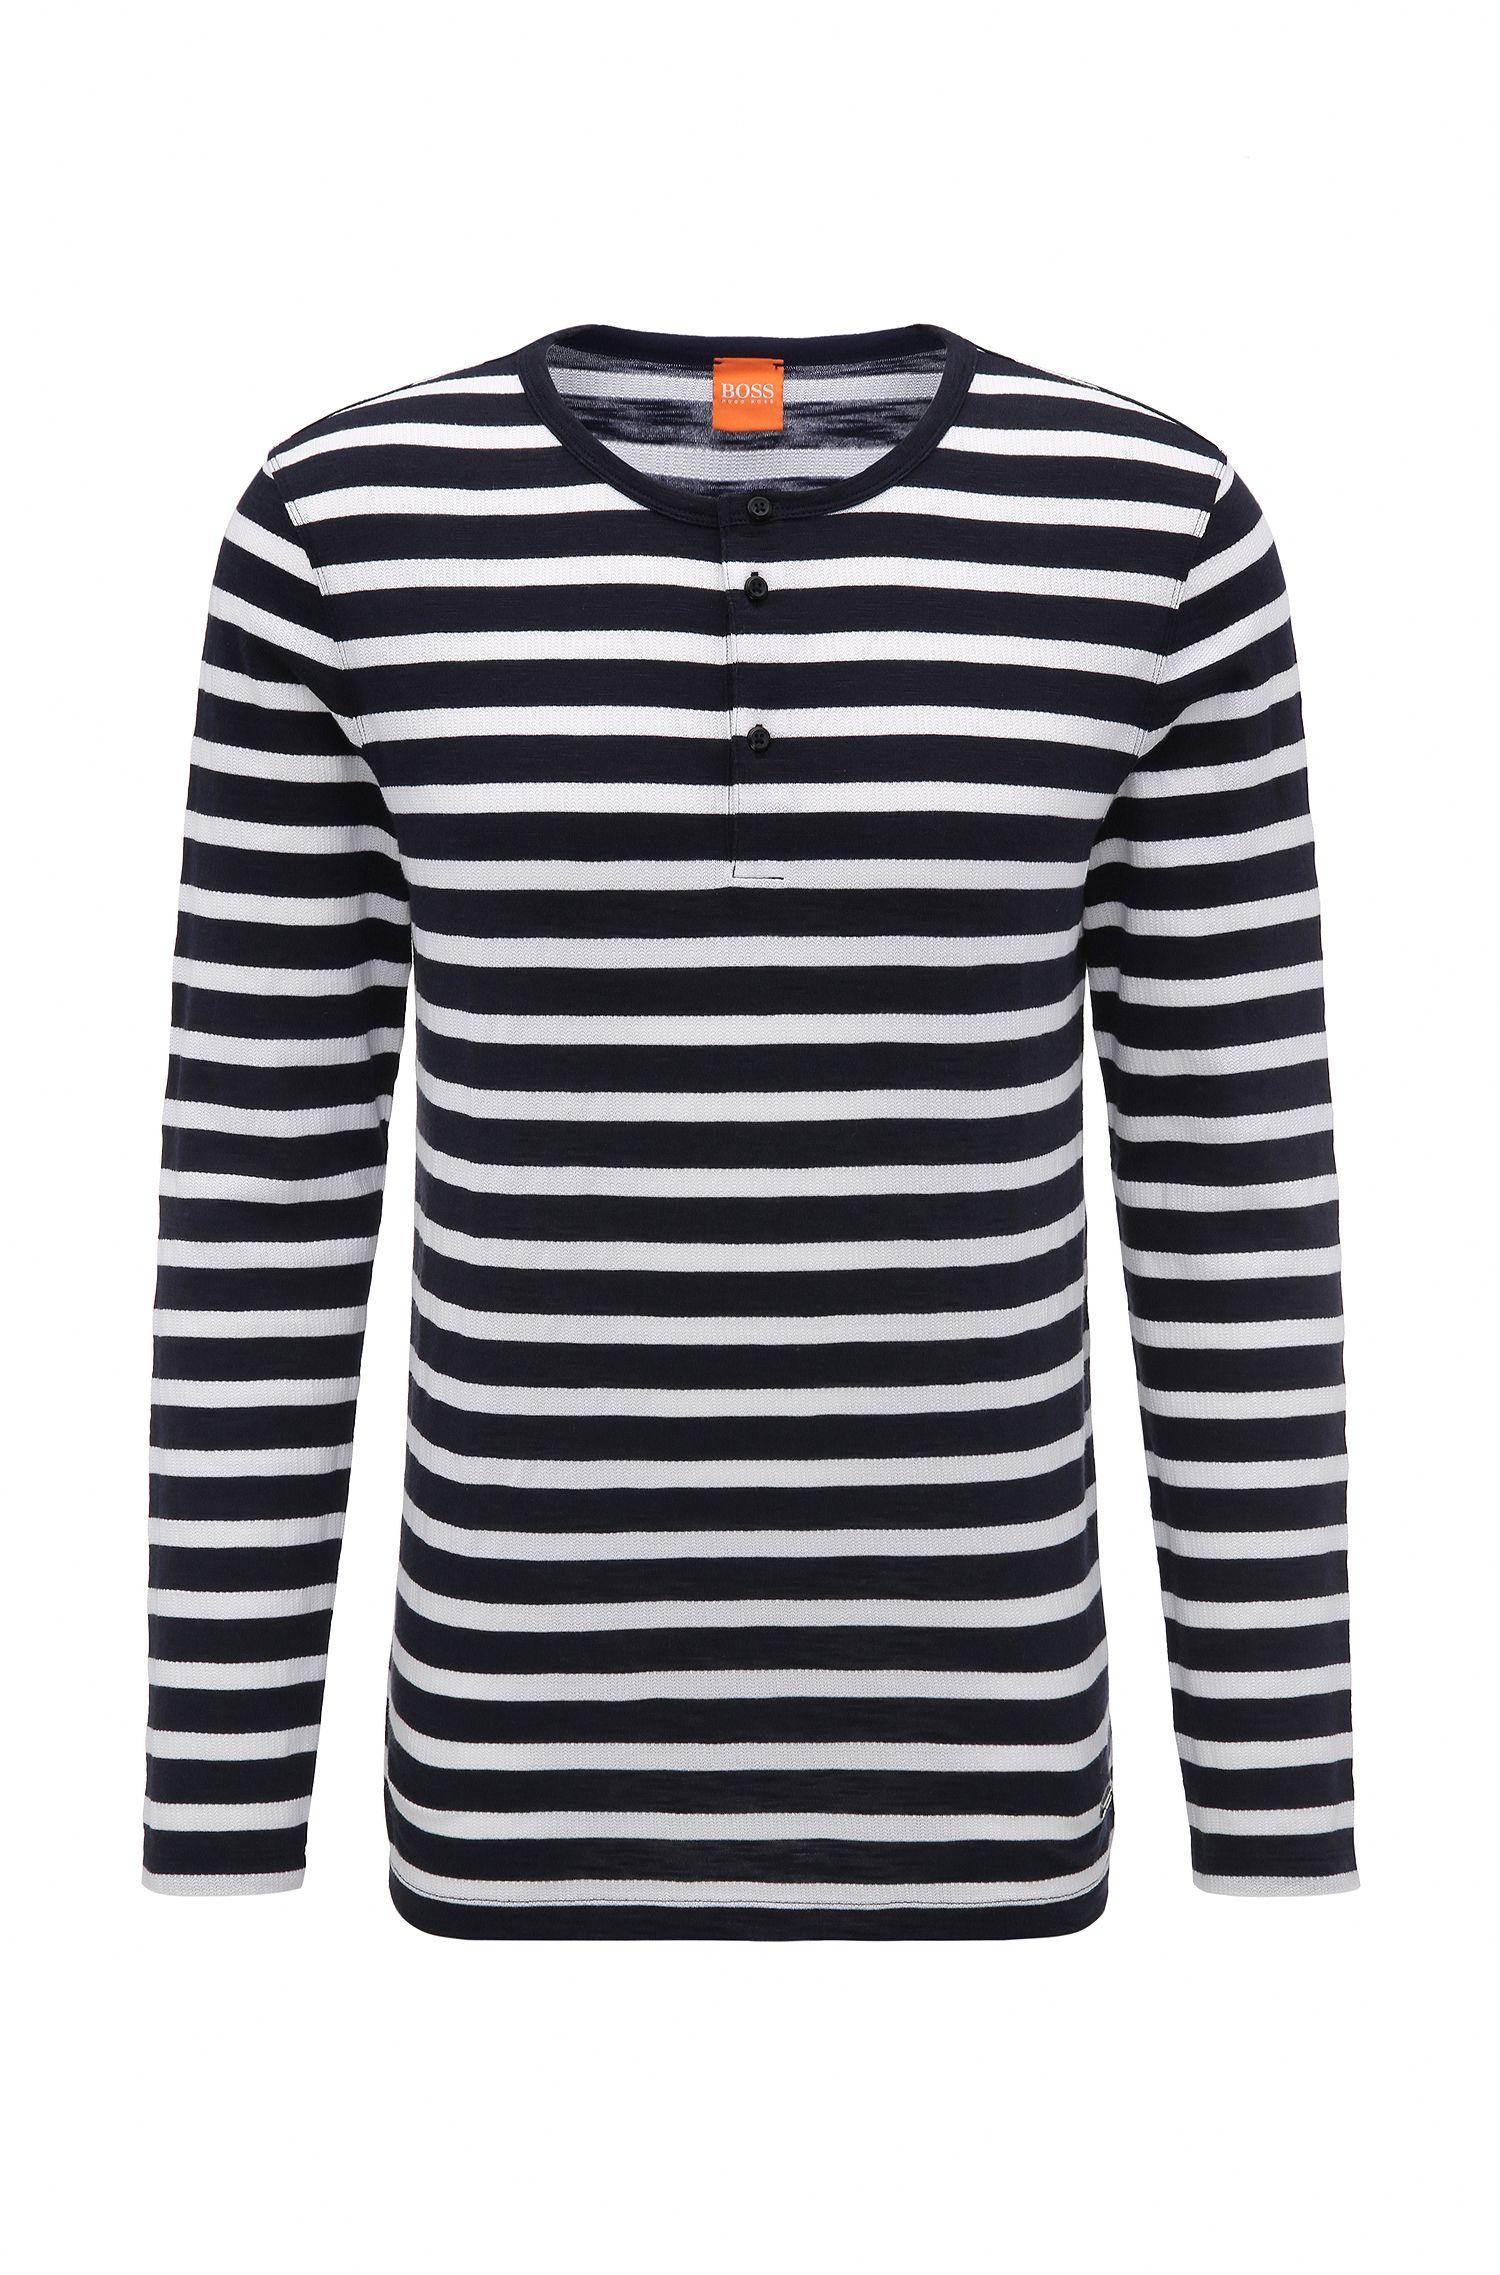 Striped Knit Henley Shirt | Translation